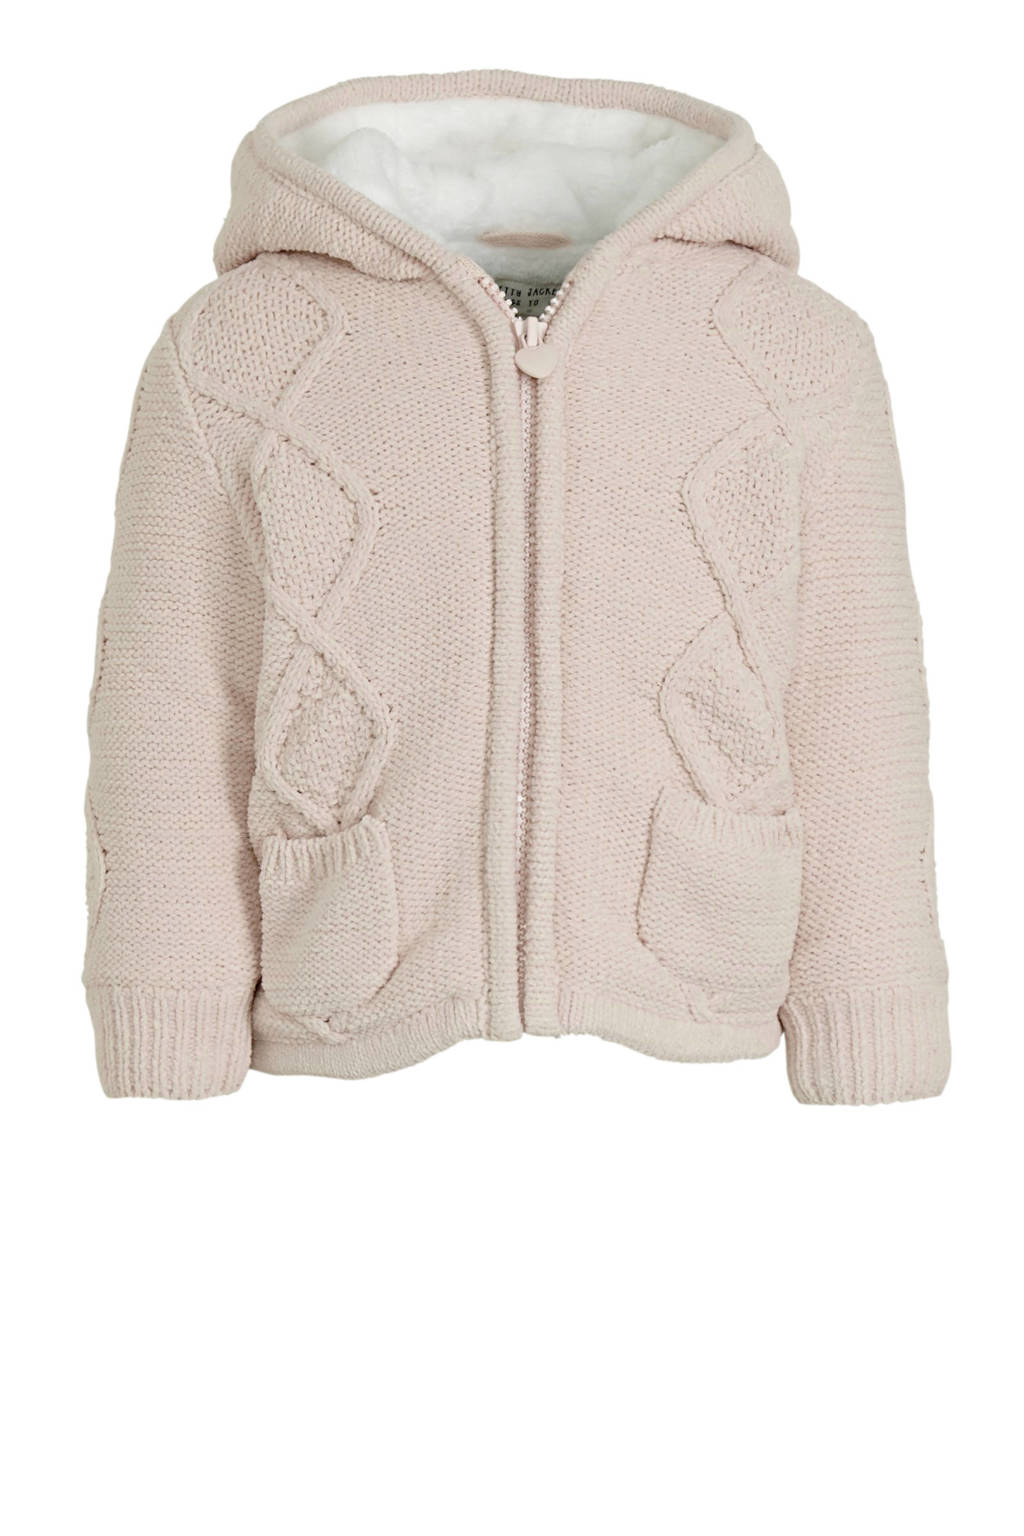 C&A Baby Club gebreide winterjas lichtroze, Lichtroze/wit